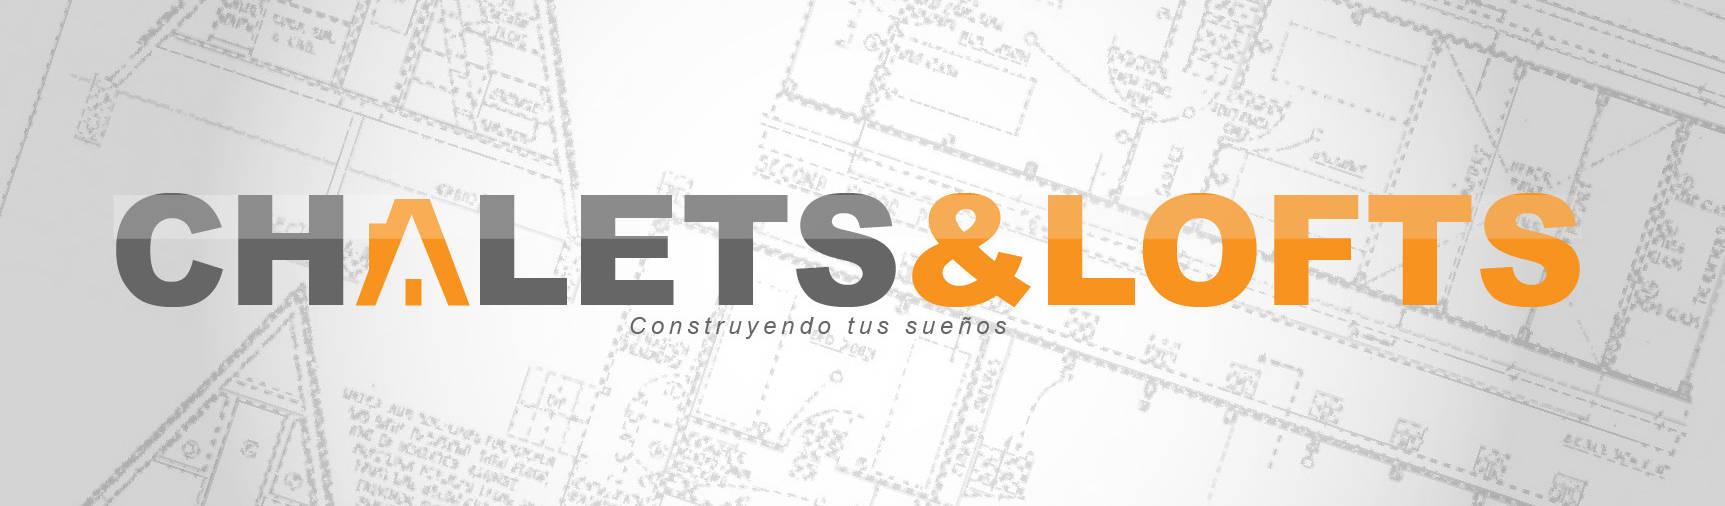 Chalets & Lofts